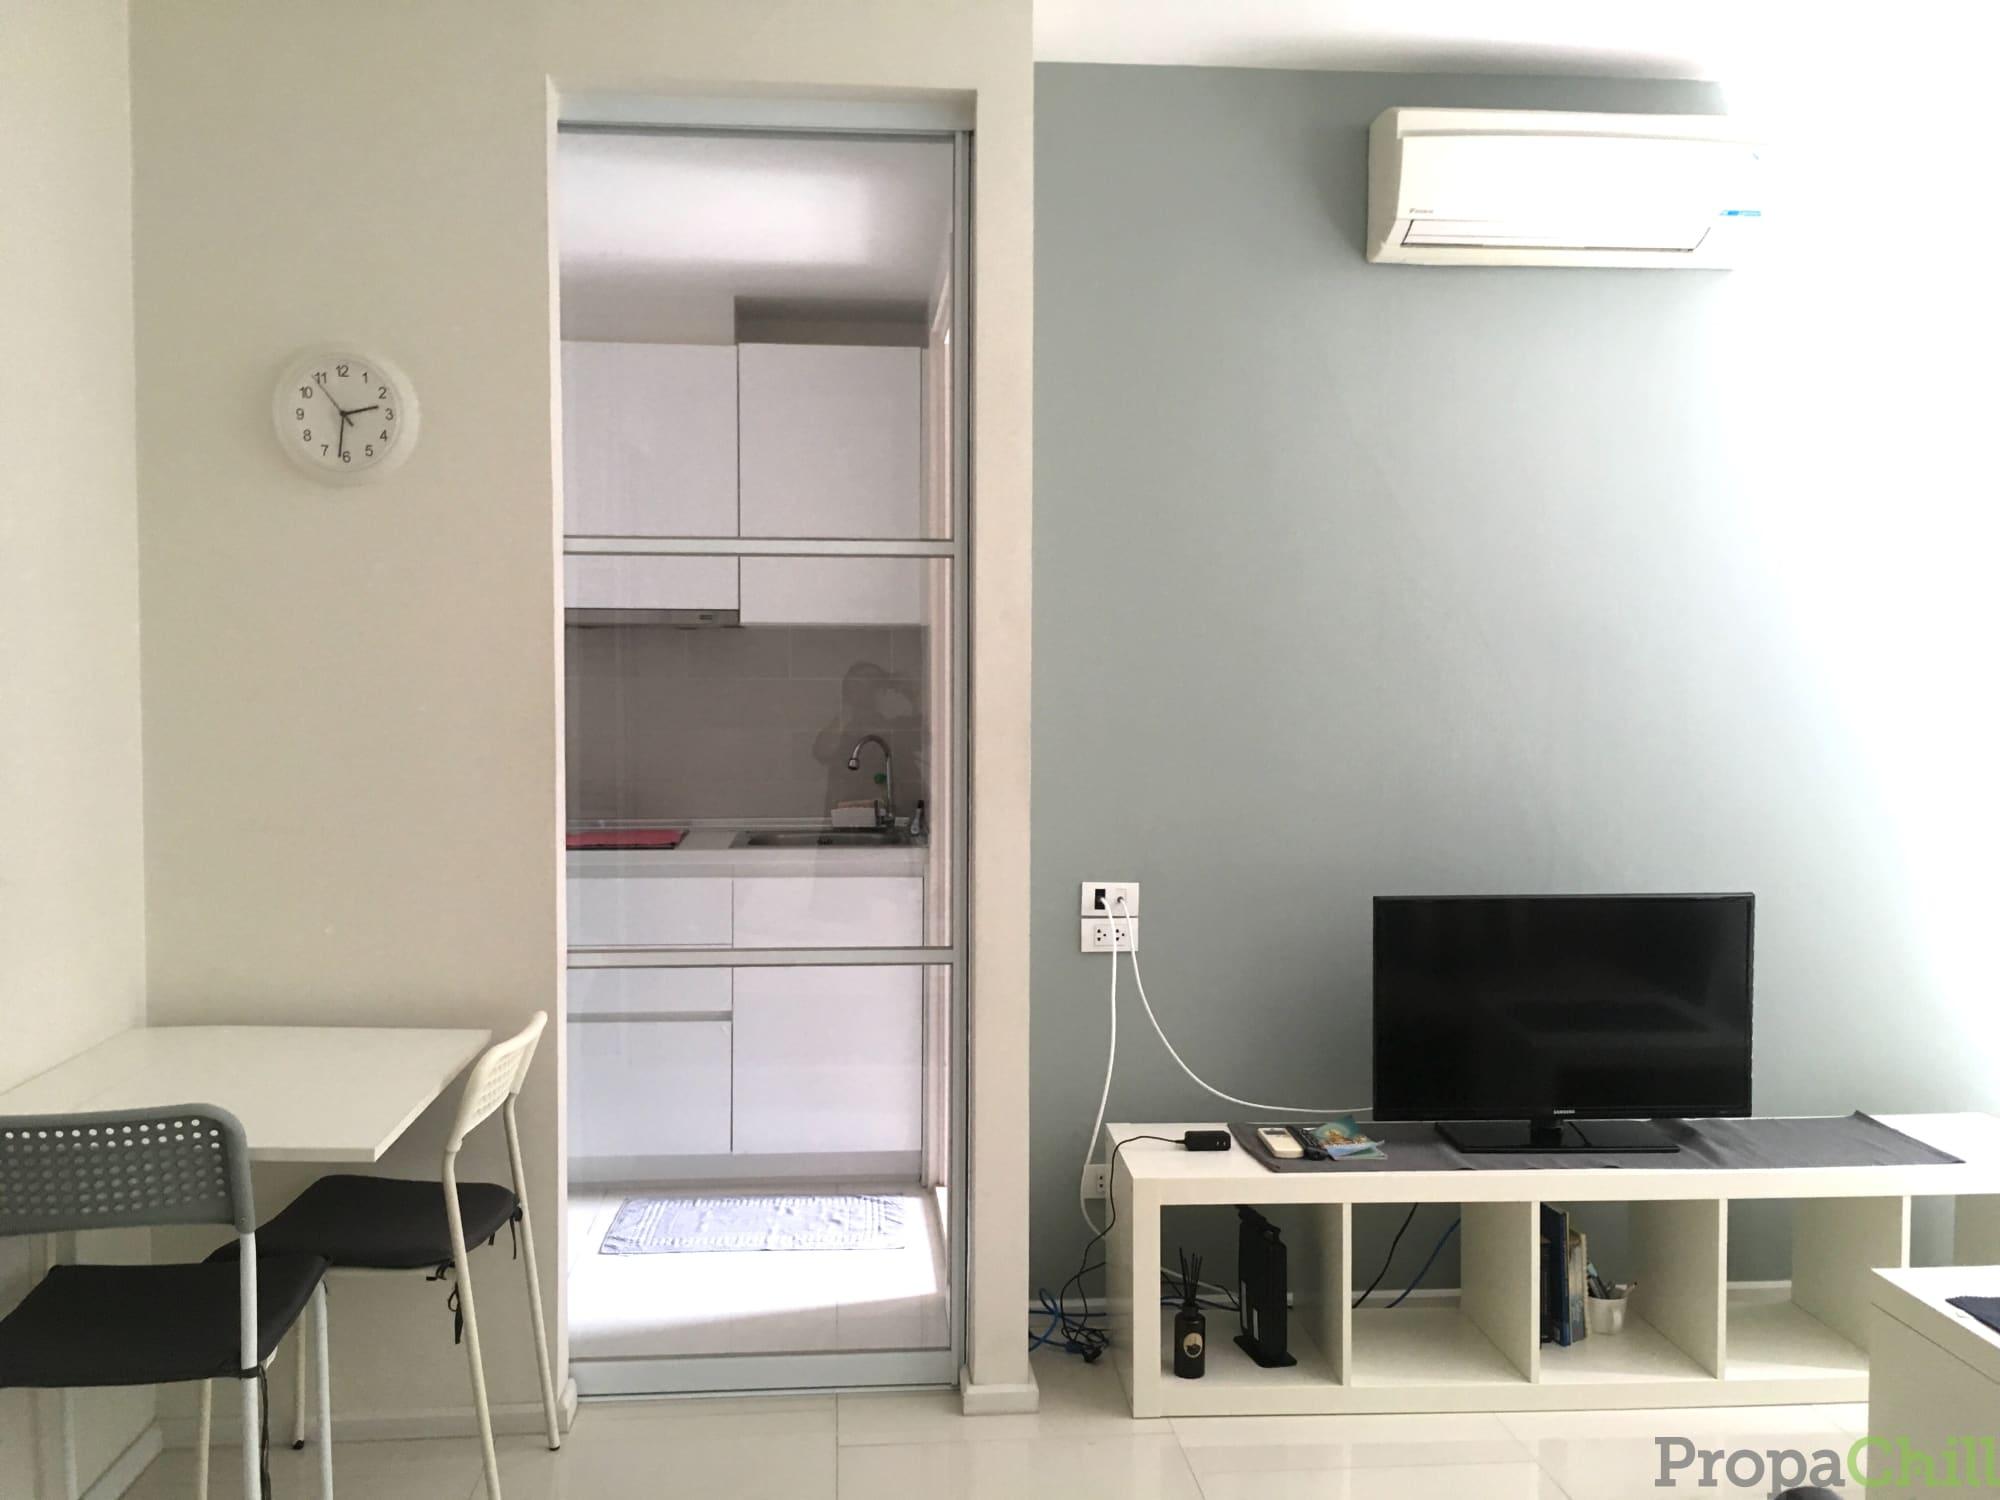 [For Rent] ให้เช่า Sense Phaholyothin *ใกล้ BTS สะพานควาย* 1 ห้องนอน 30 ตร.ม. ชั้น 19 ตกแต่ง+เครื่องใช้ไฟฟ้าครบ ห้องสวย วิวดี หิ้วกระเป๋าเข้าอยู่ได้เลย (1 BR 30 SQM fully furnished)